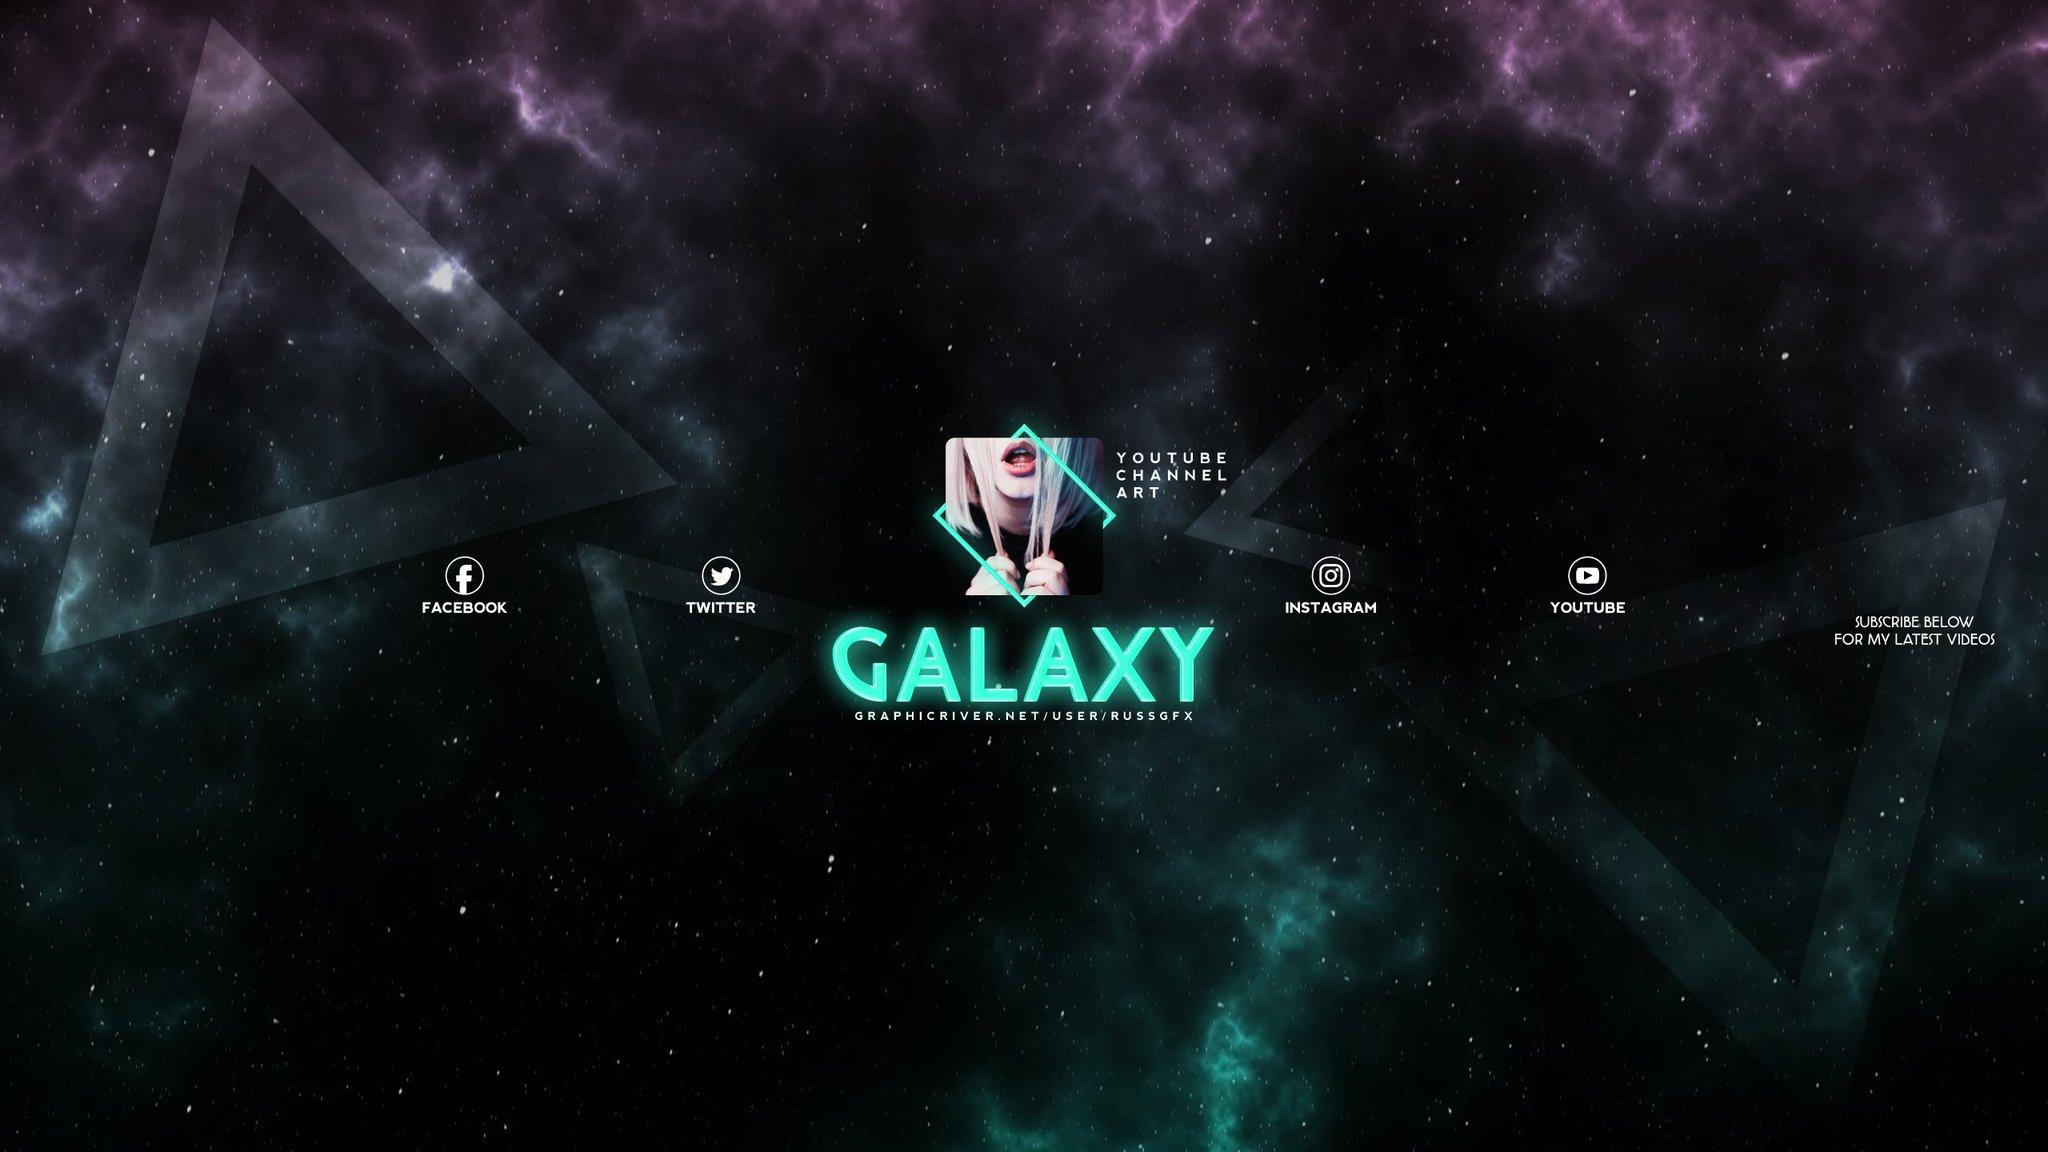 2048x1152 Youtube Banner Galaxy